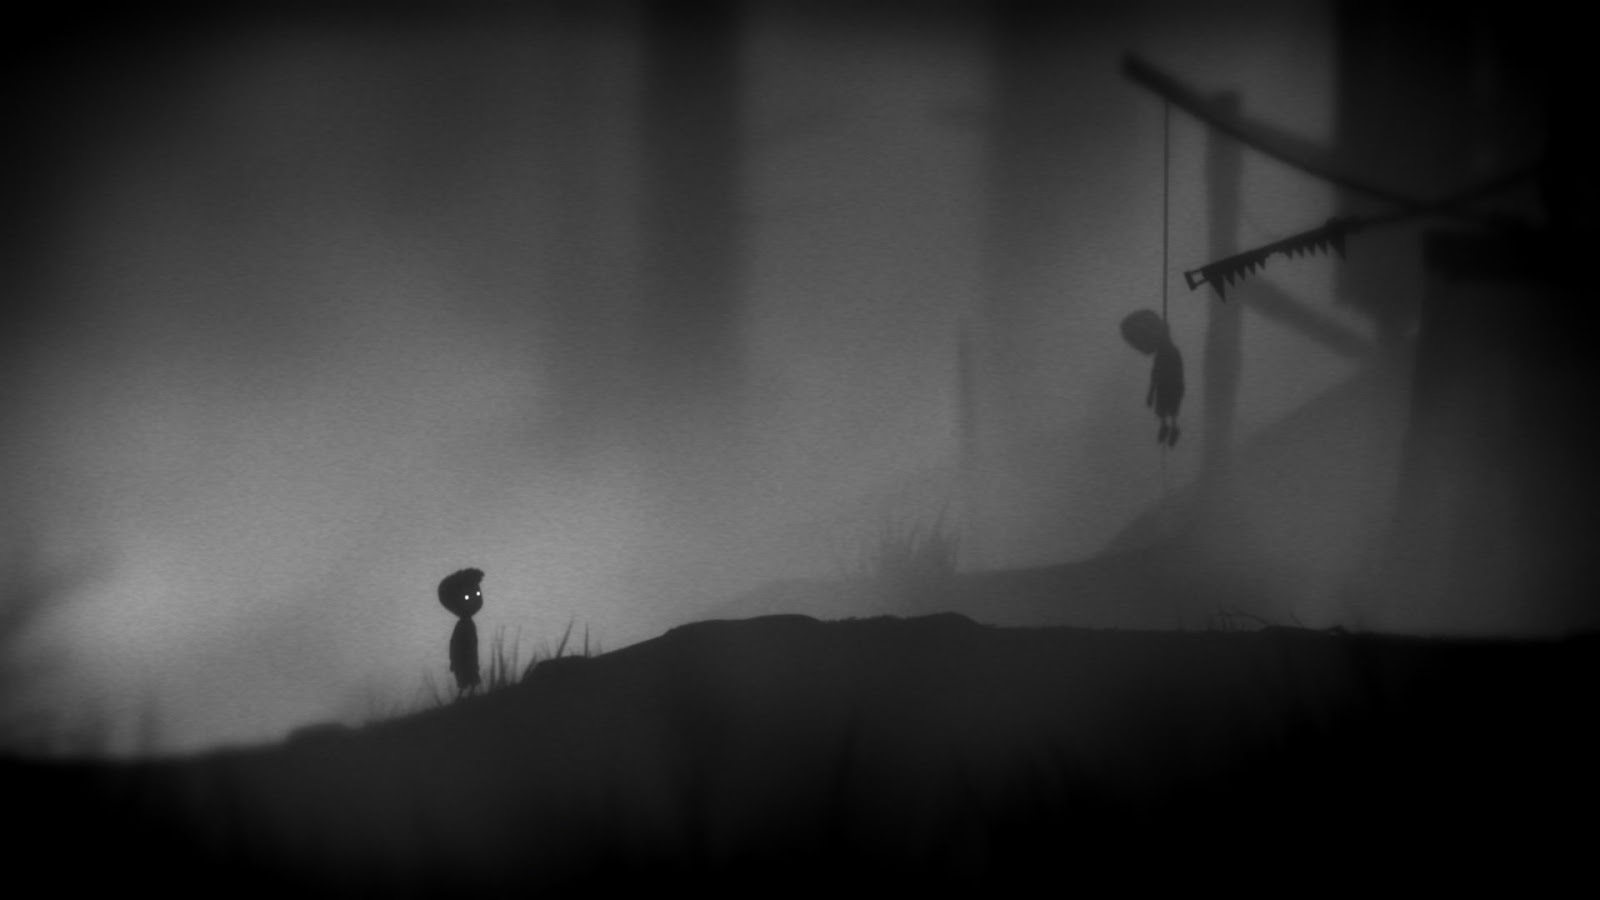 Game Horror Limbo